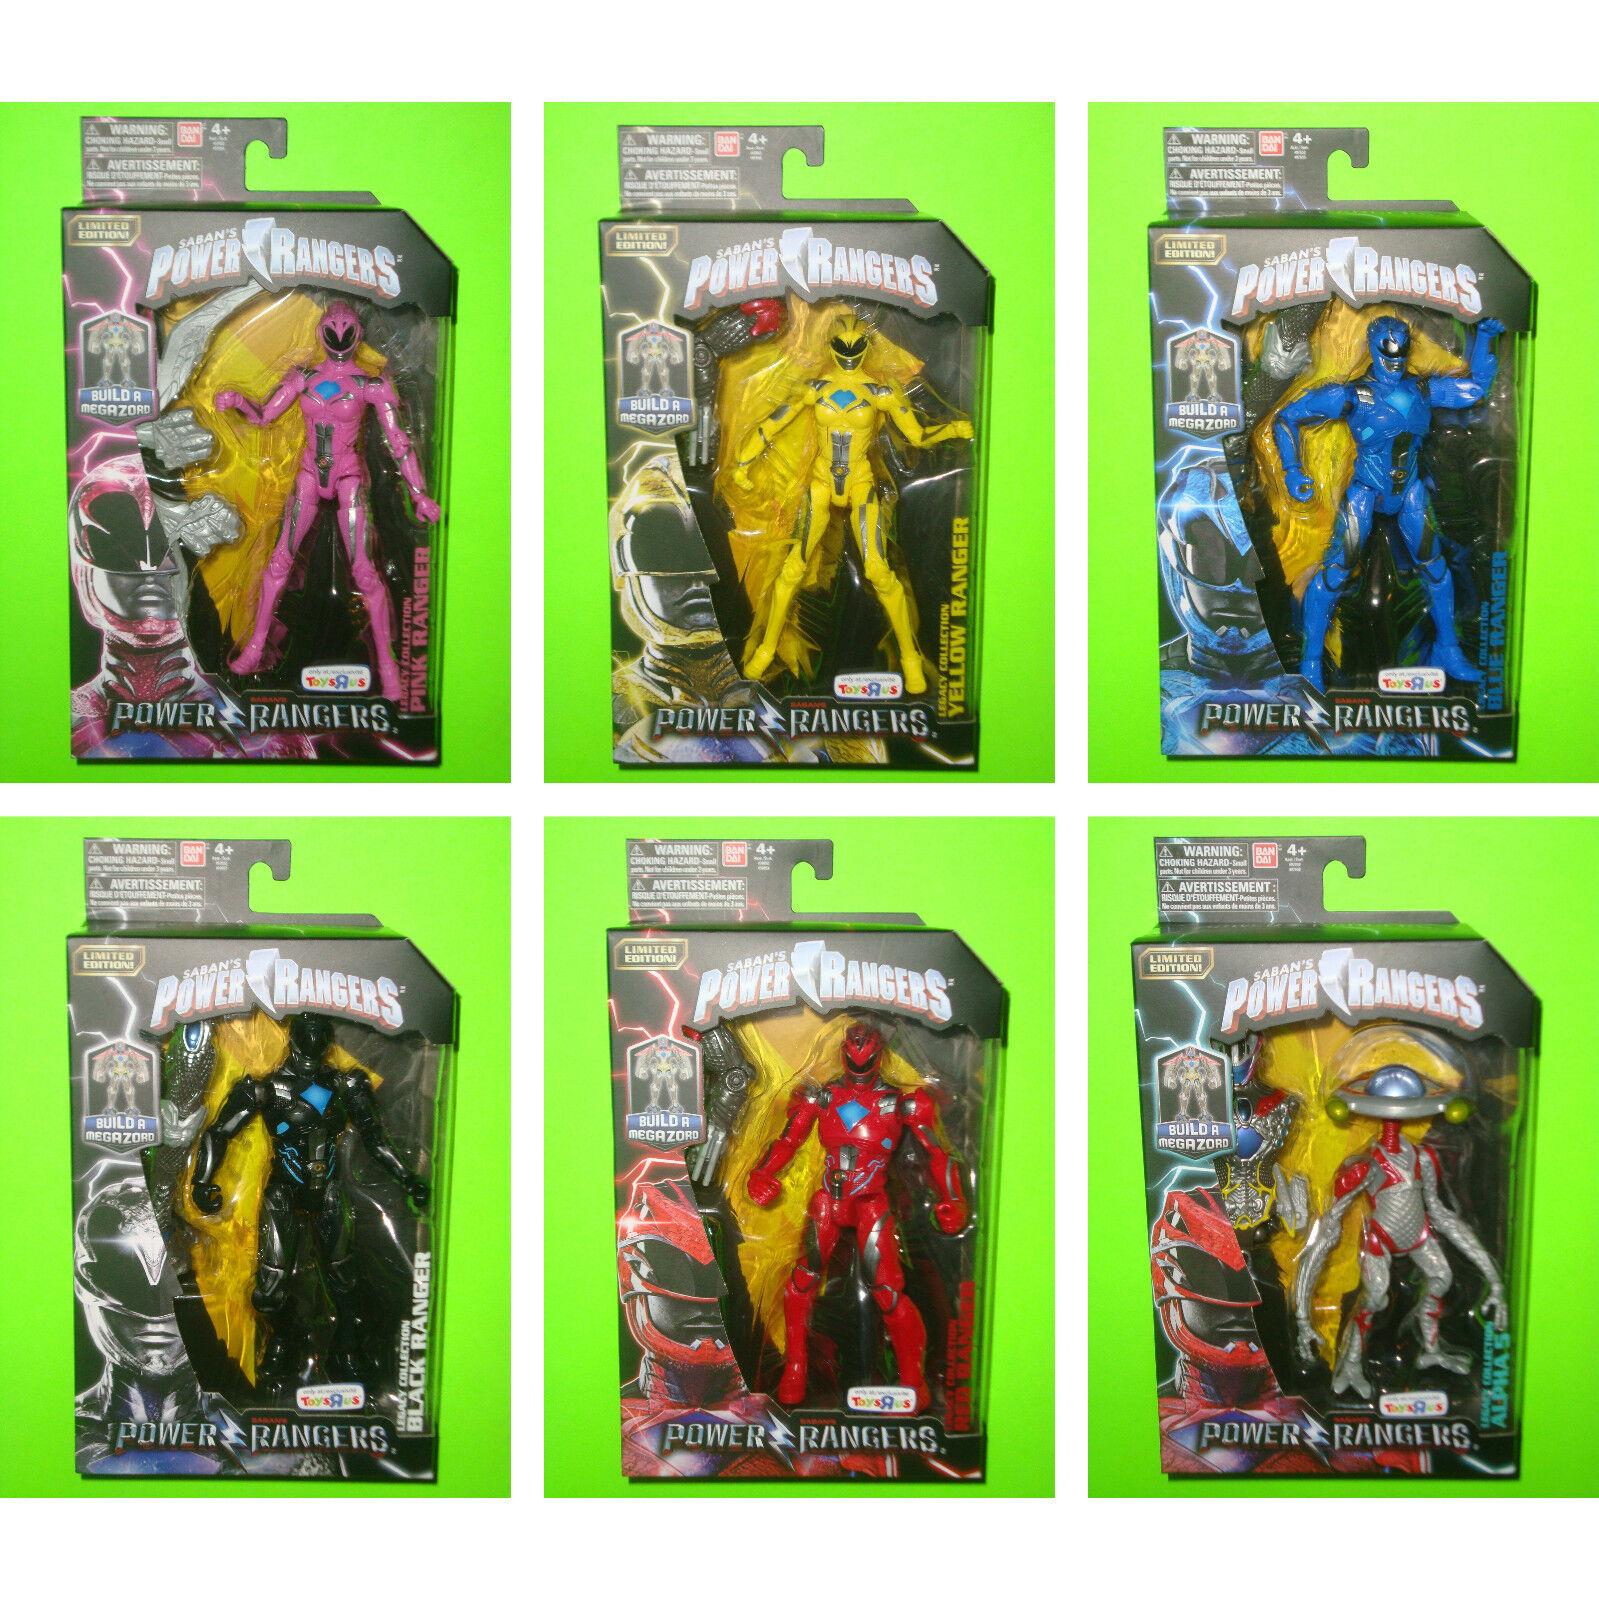 Set Aller 6 - 2017 Power Rangers 15.2cm Legacy Kollektion Spielsachen R Us